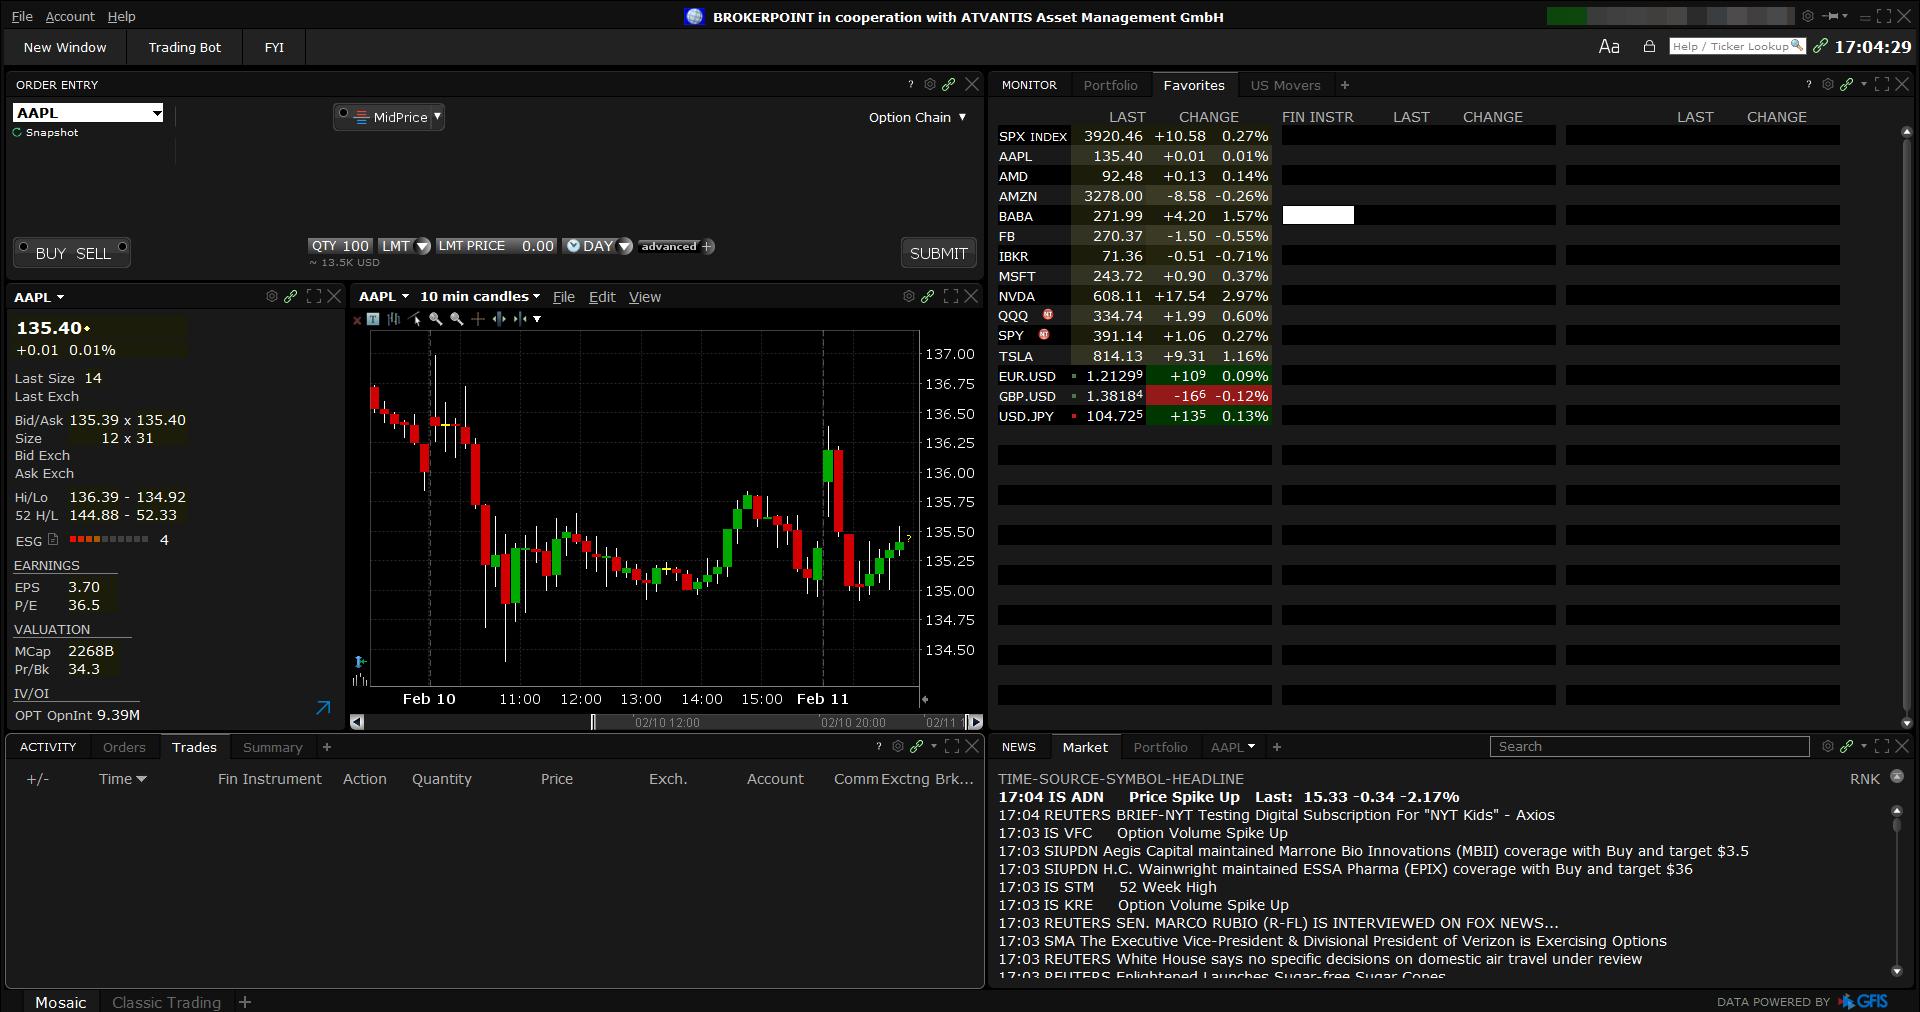 Brokerpoint review - Desktop trading platform